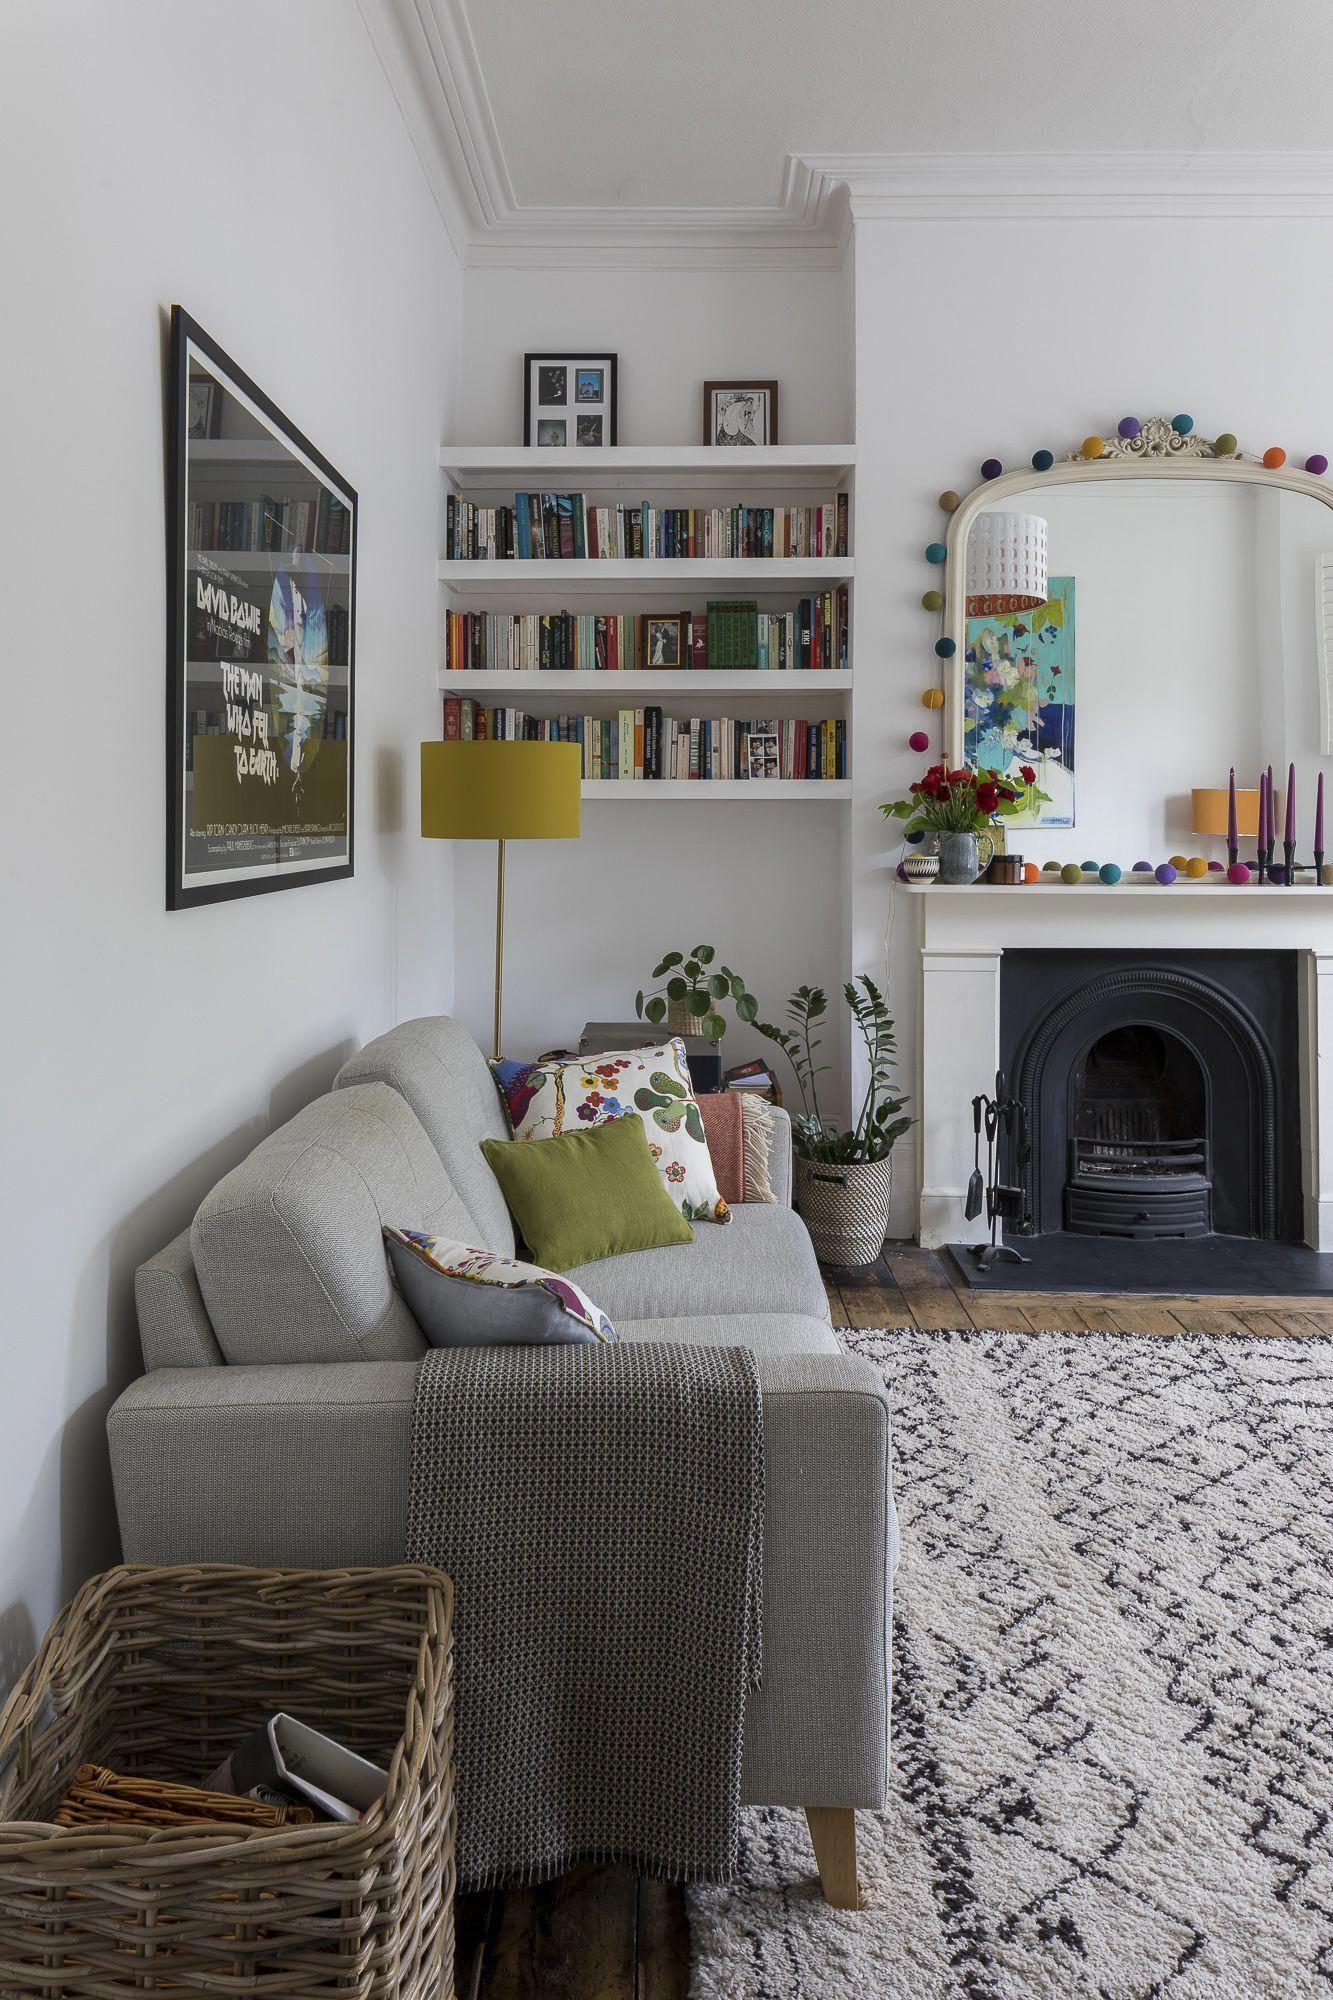 Home decor tips and techniques for contemporary interior design living room contemporaryinteriordesignlivingroom also barcelona bench seater replica rh pinterest